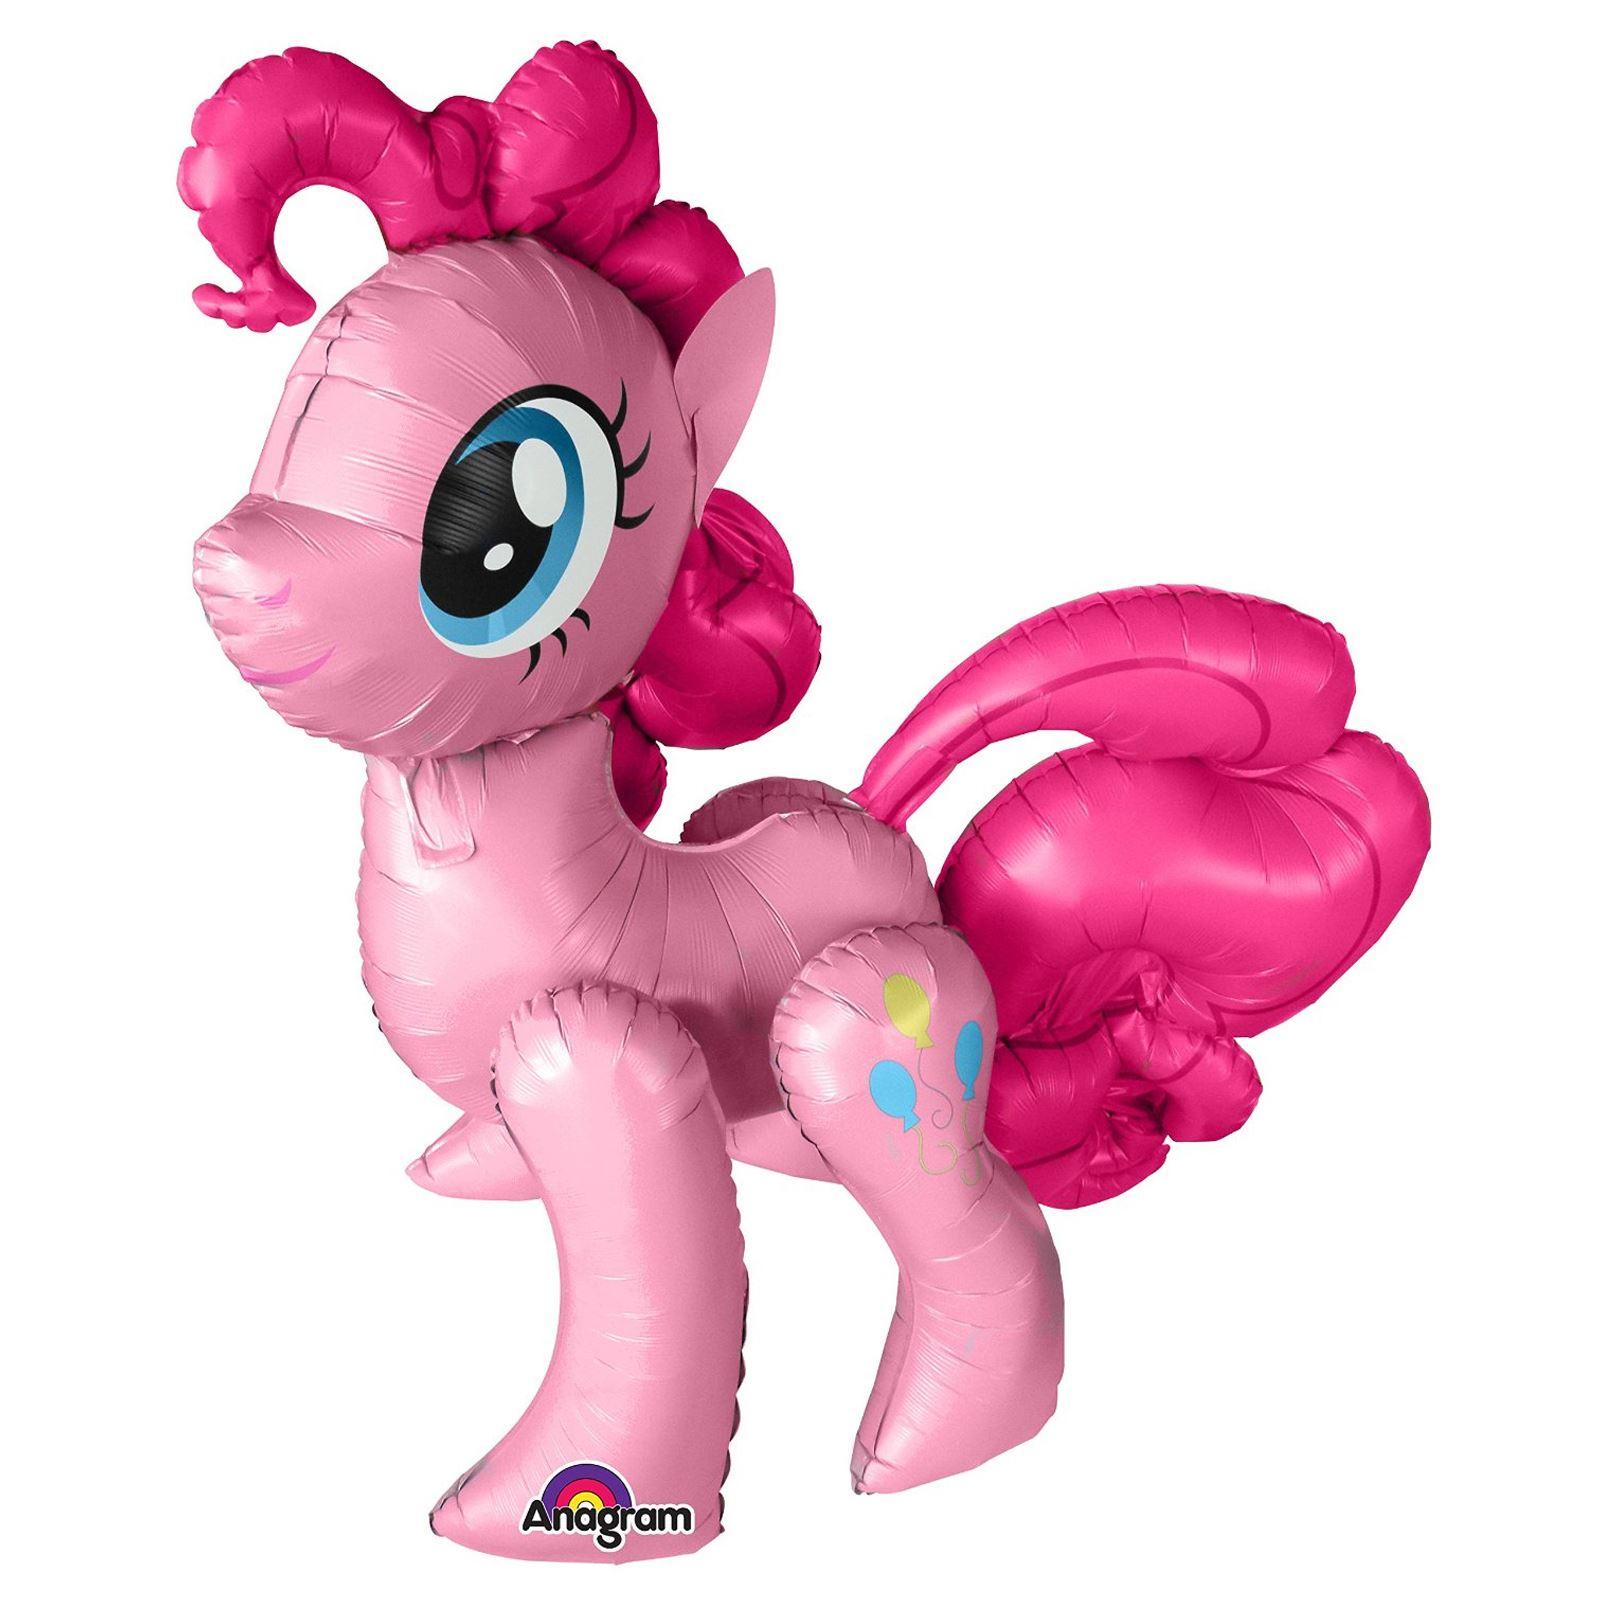 "9 x12/"" LATEX My Little Pony Pinkie Pie Party Supershape Airwalker Foil Balloon"